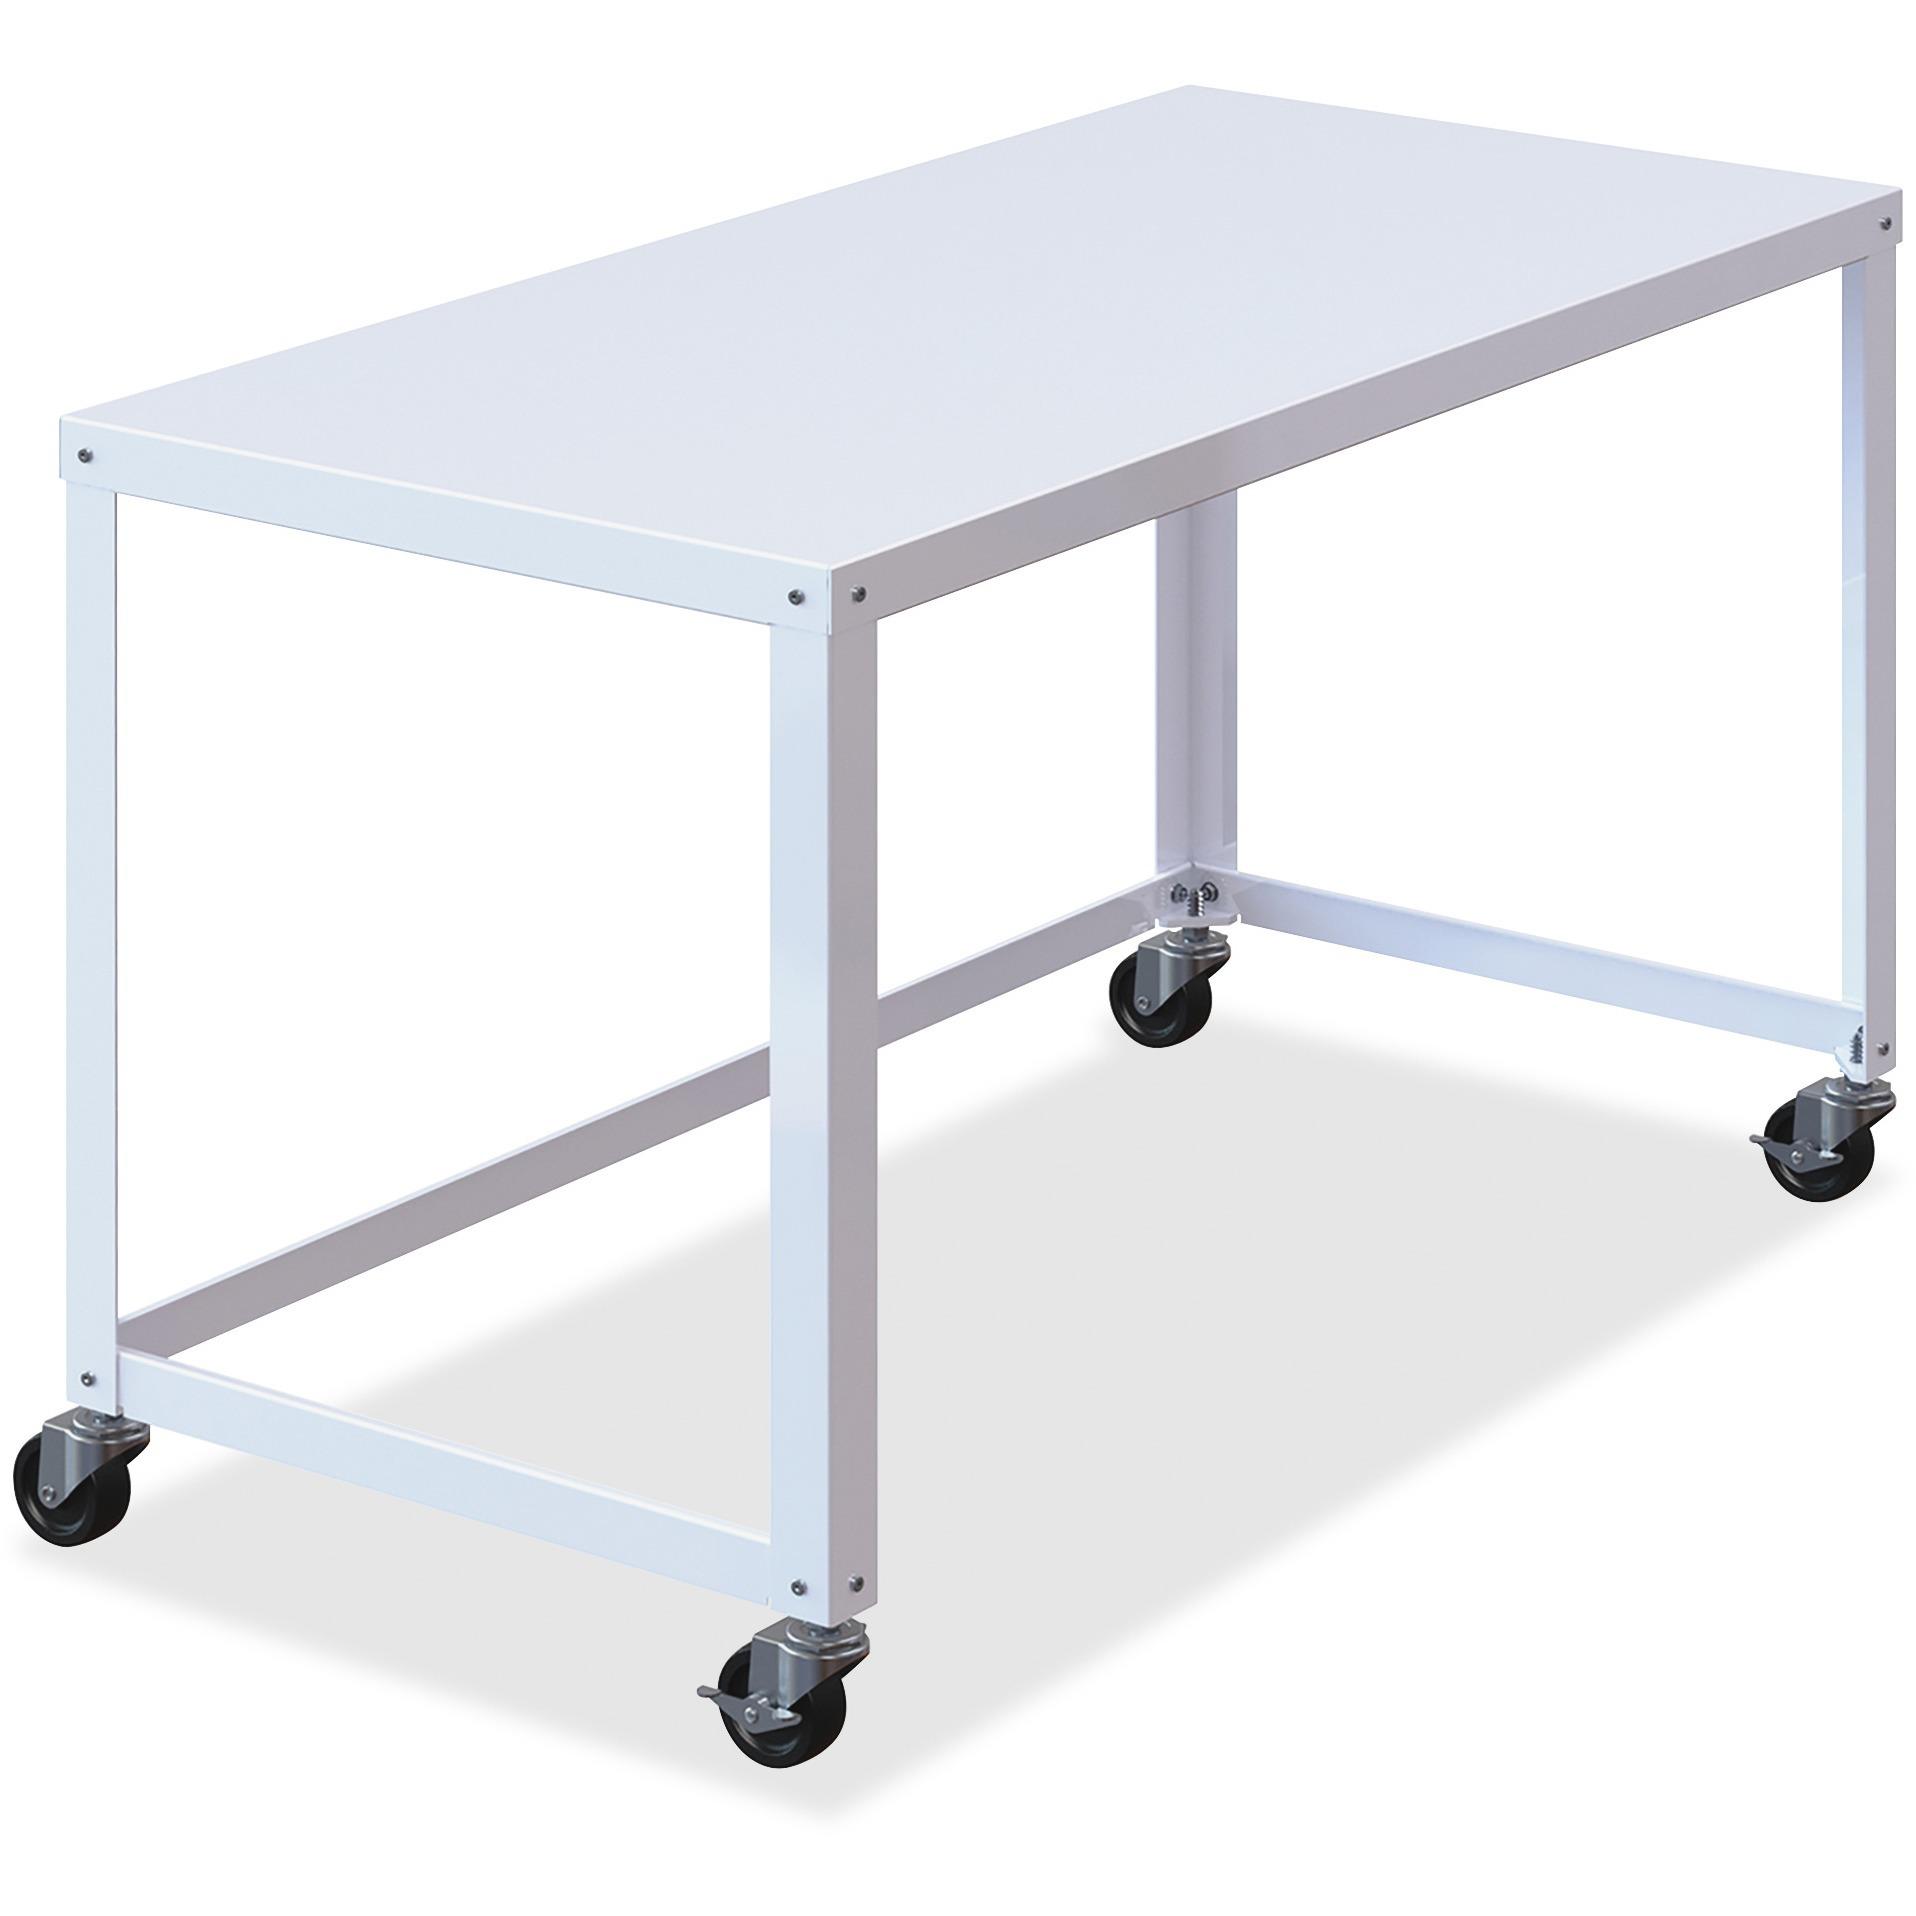 Lorell, LLR34418, Personal Mobile Desk, 1 Each